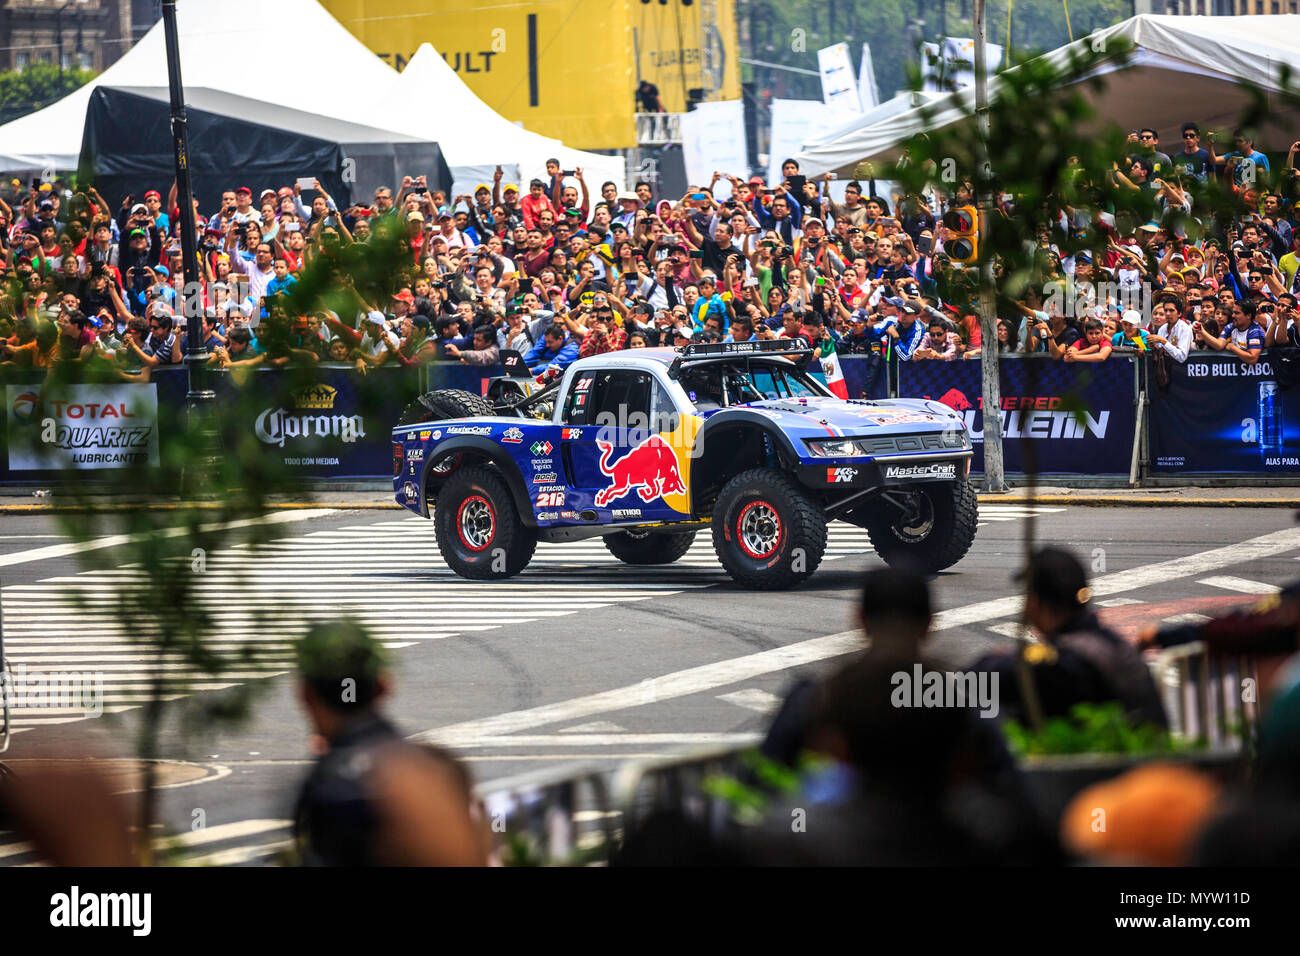 Mexico City, Mexico - June 27, 2015: Gustavo Vildosola driving around the Zocalo Square, at the Infiniti Red Bull Racing F1 Showrun. - Stock Image